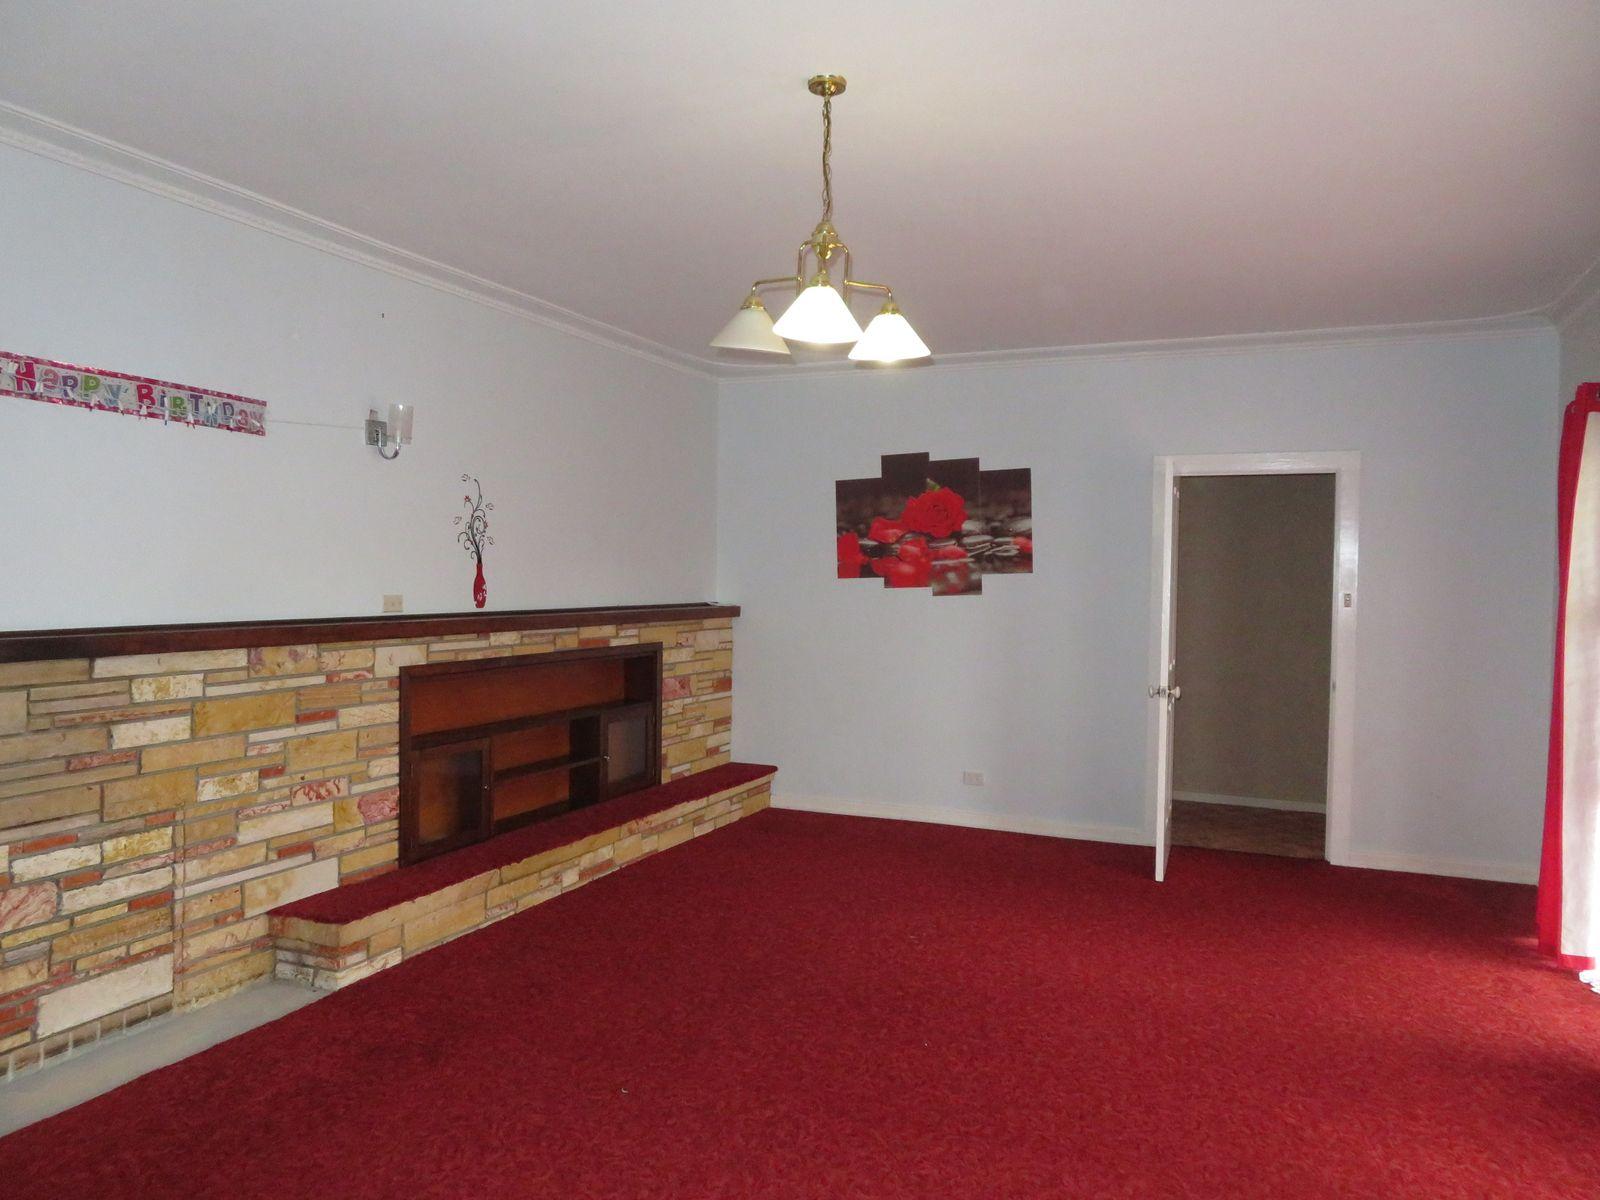 2 Webster Street, Mount Barker, WA 6324